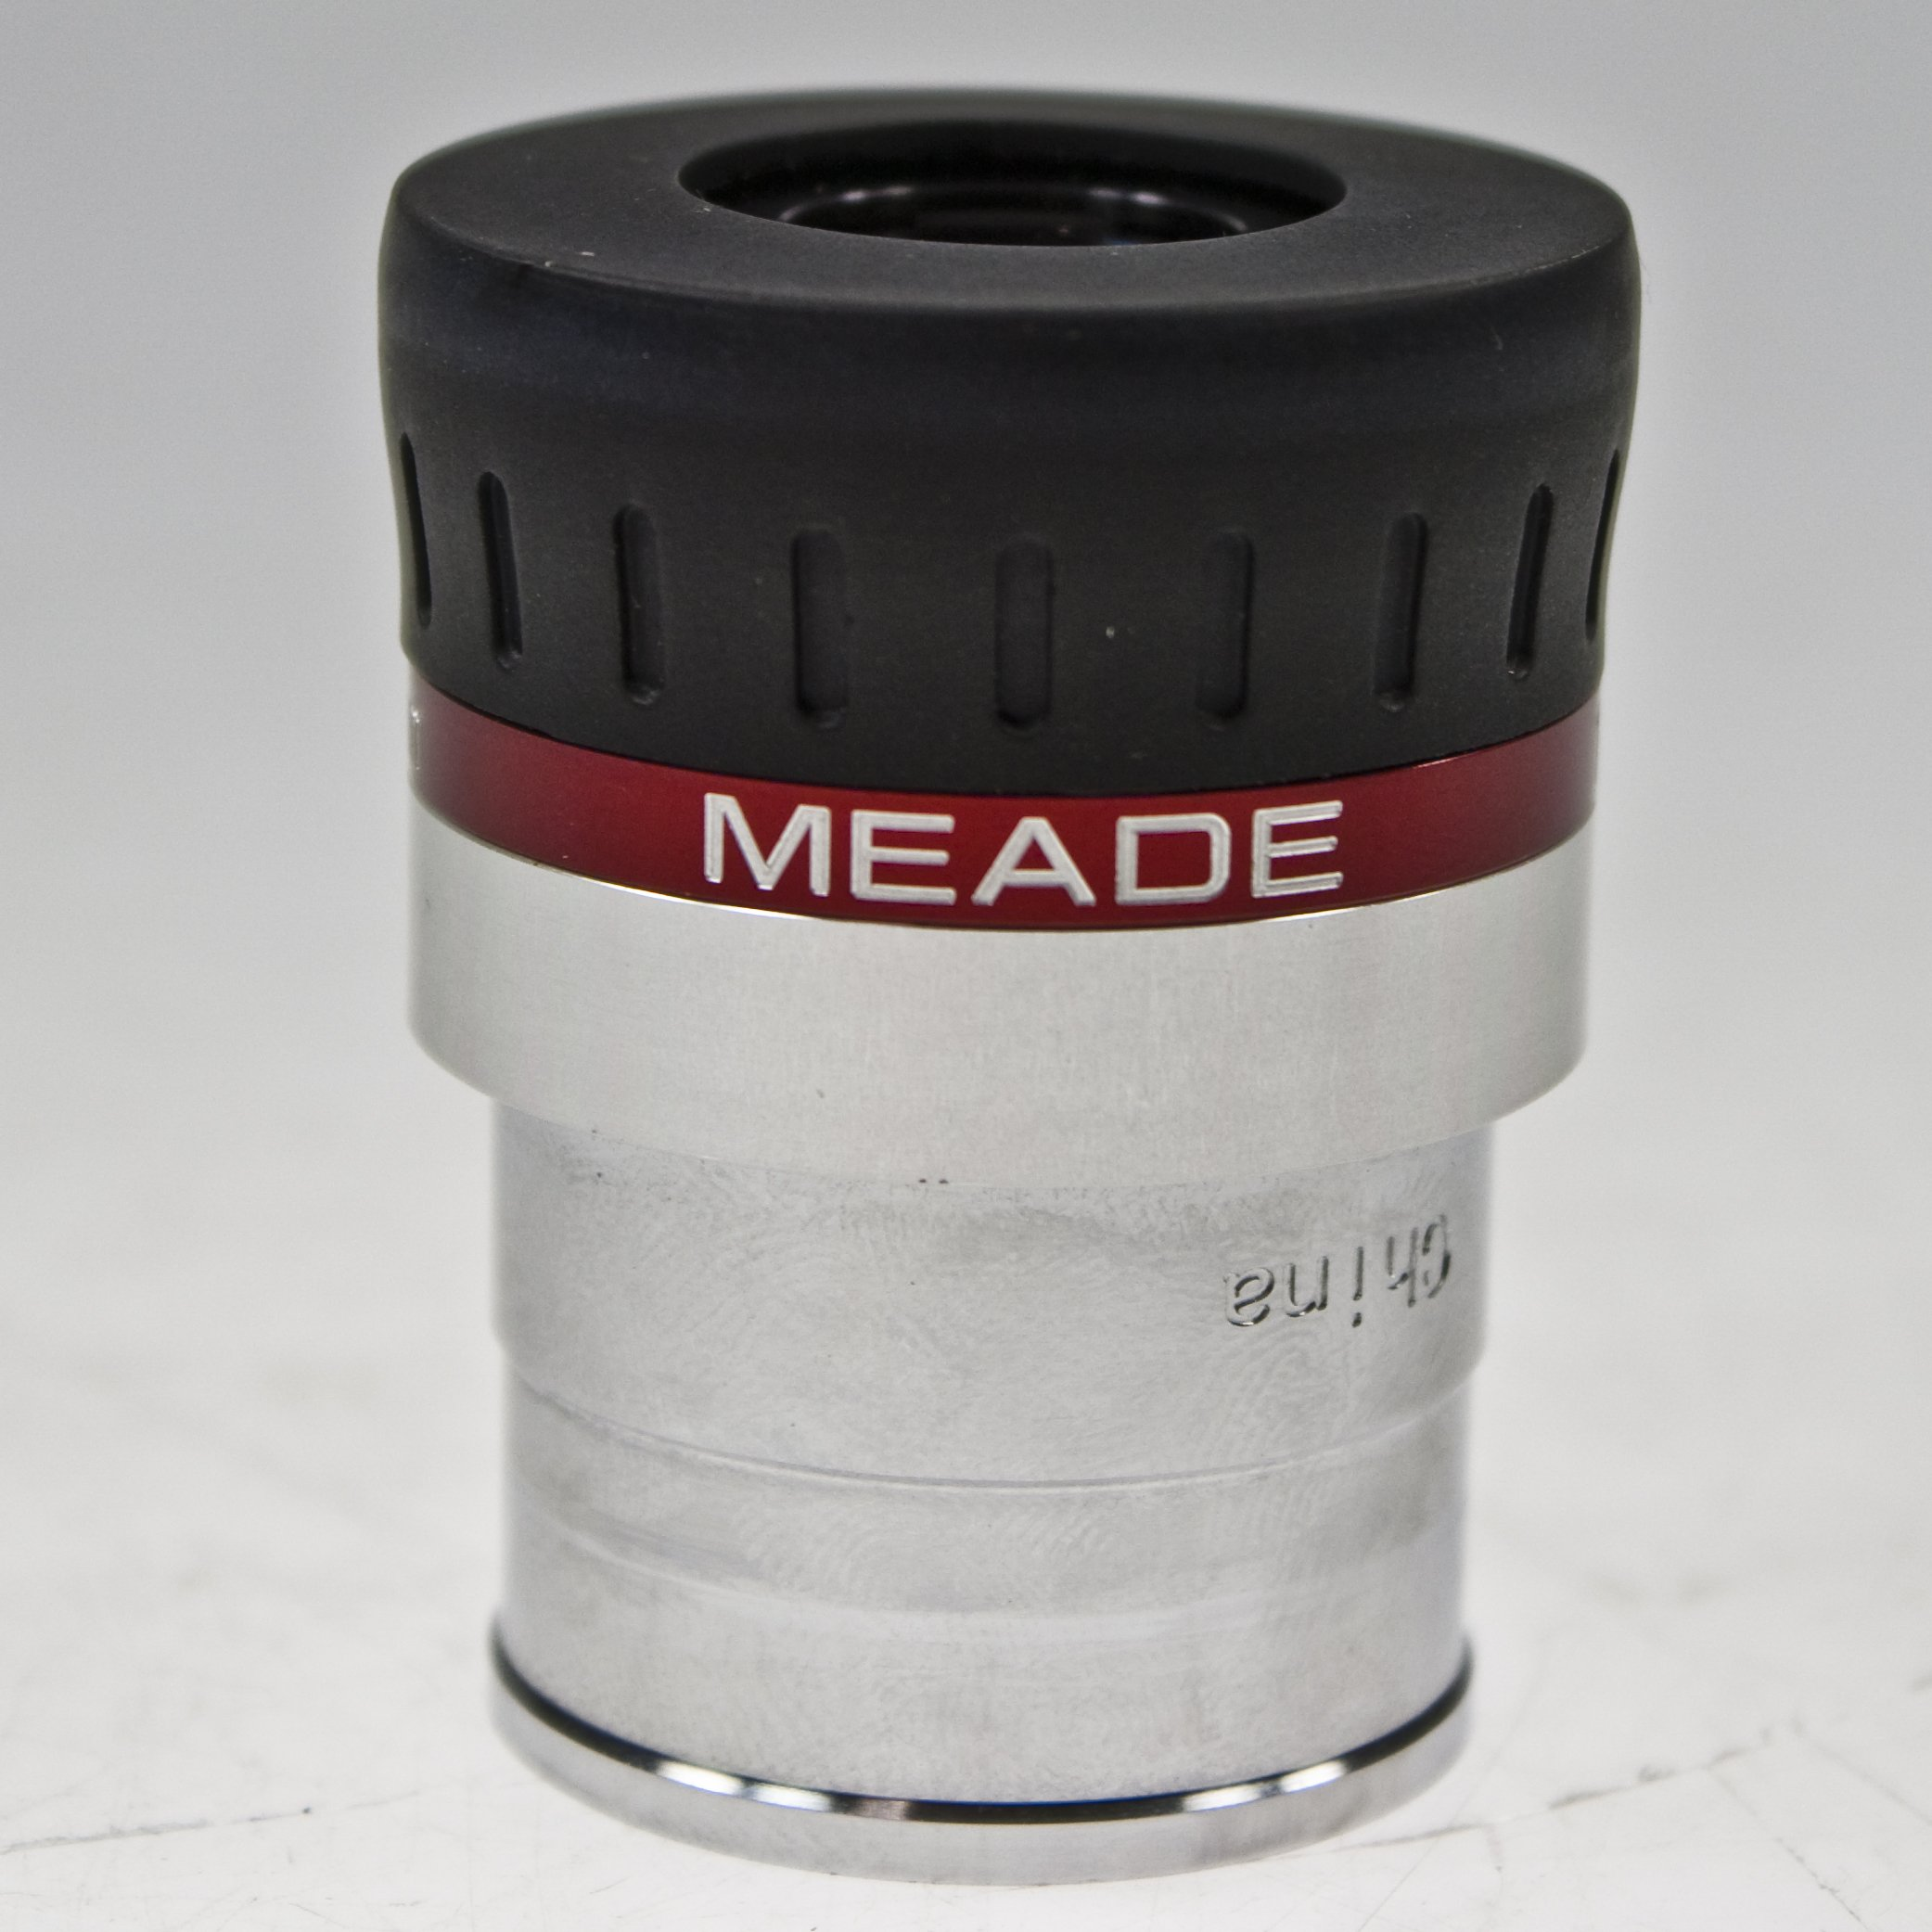 MEADE Okulár 14mm Serie 5000